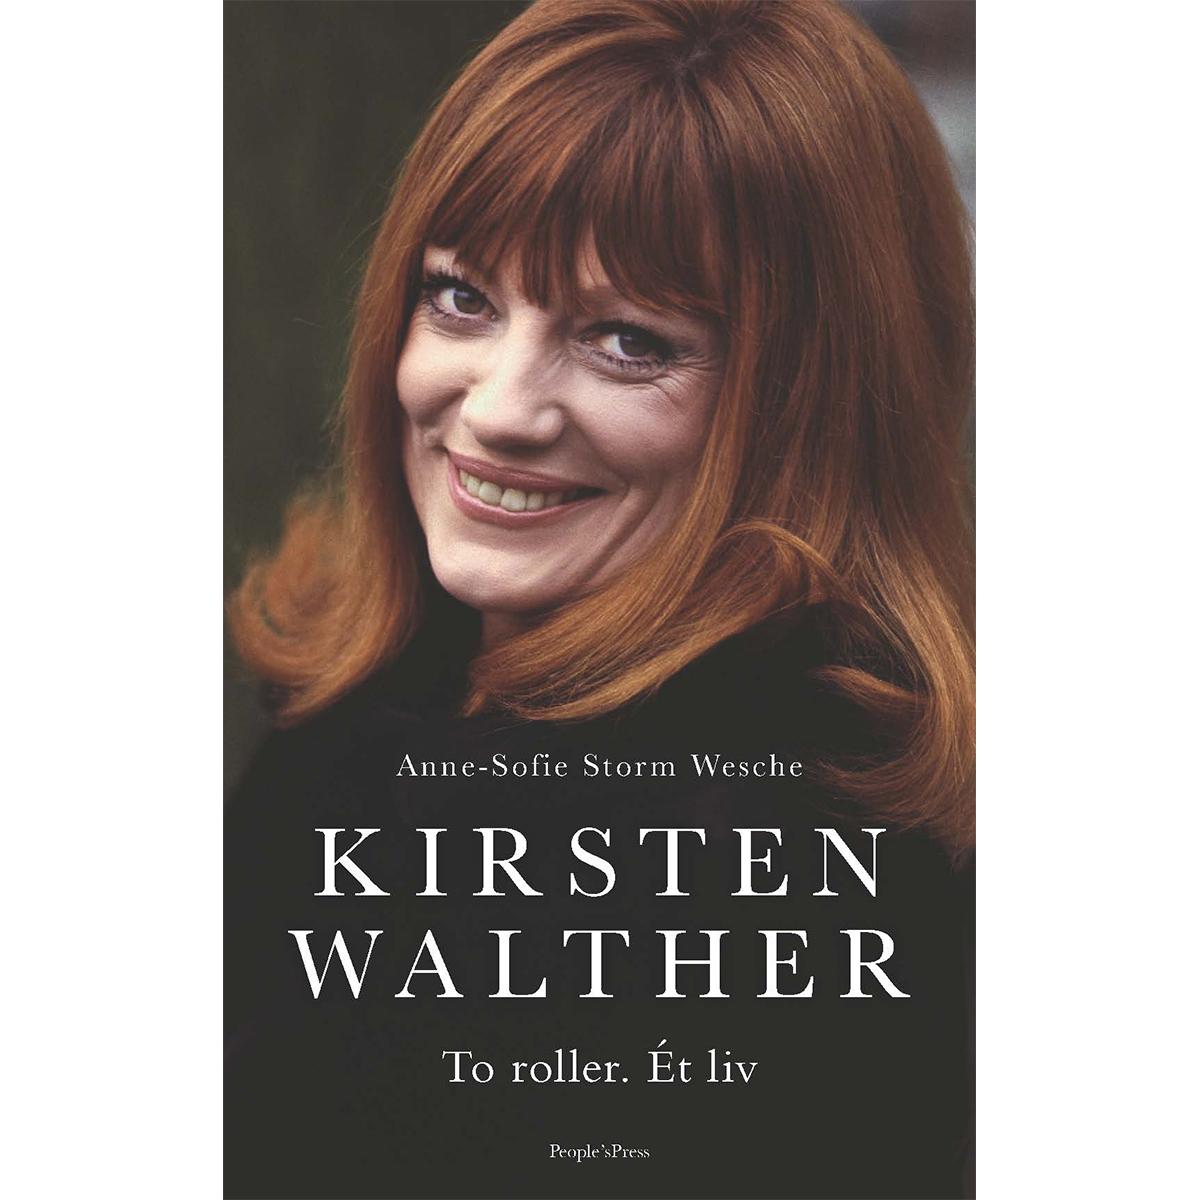 Kirsten Walther - To roller. Ét liv - Indbundet